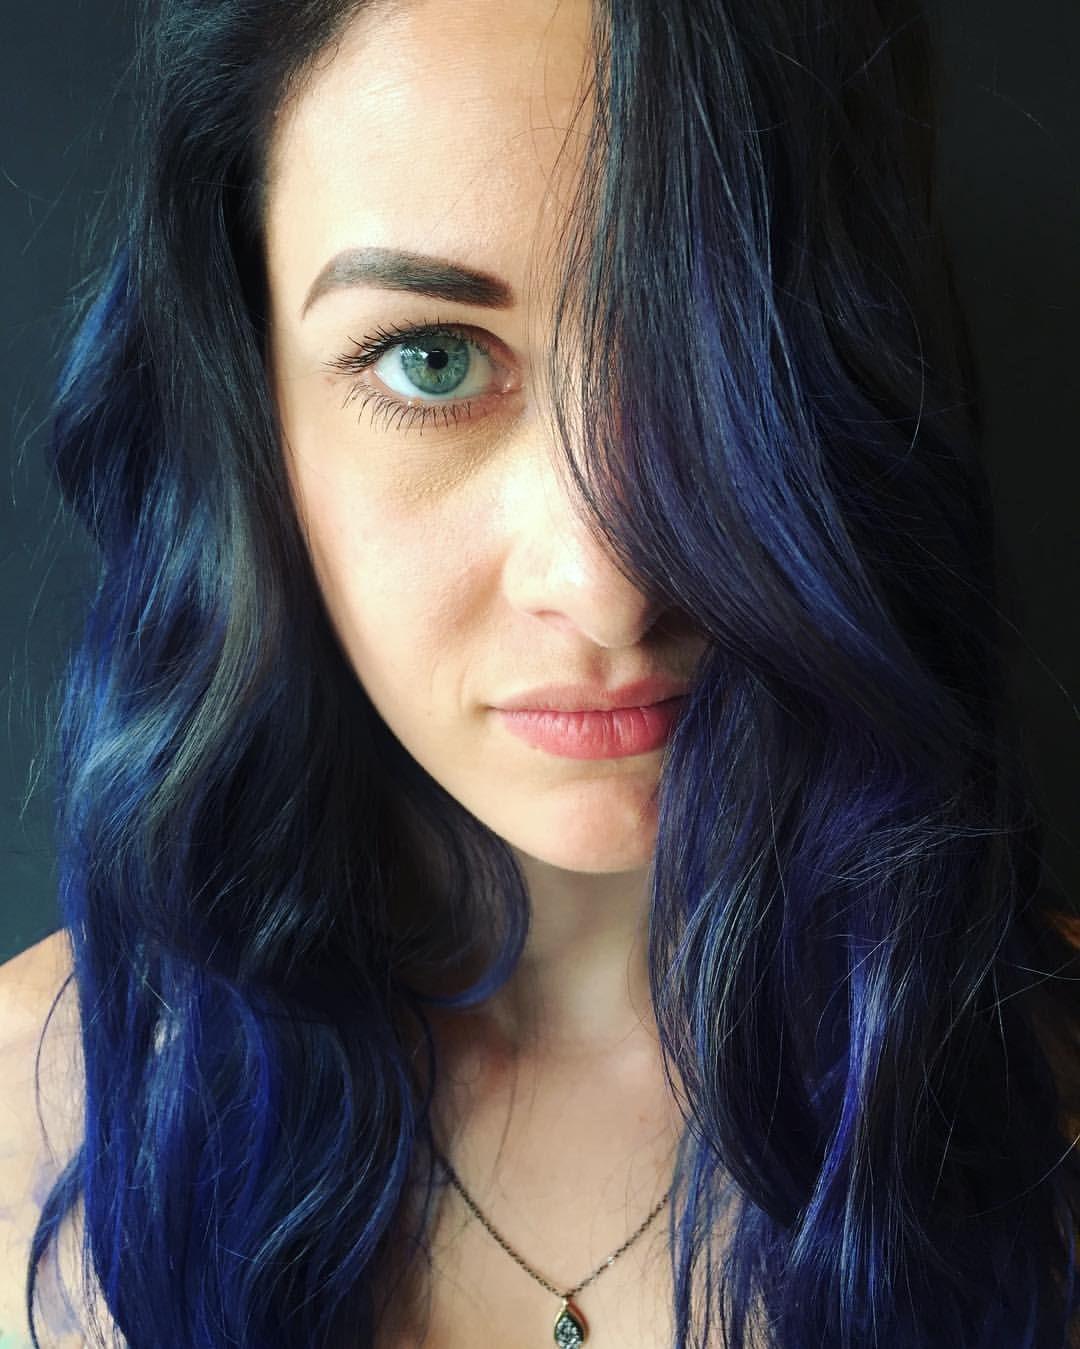 Likes  Comments  BLEACH bleachlondon on Instagram